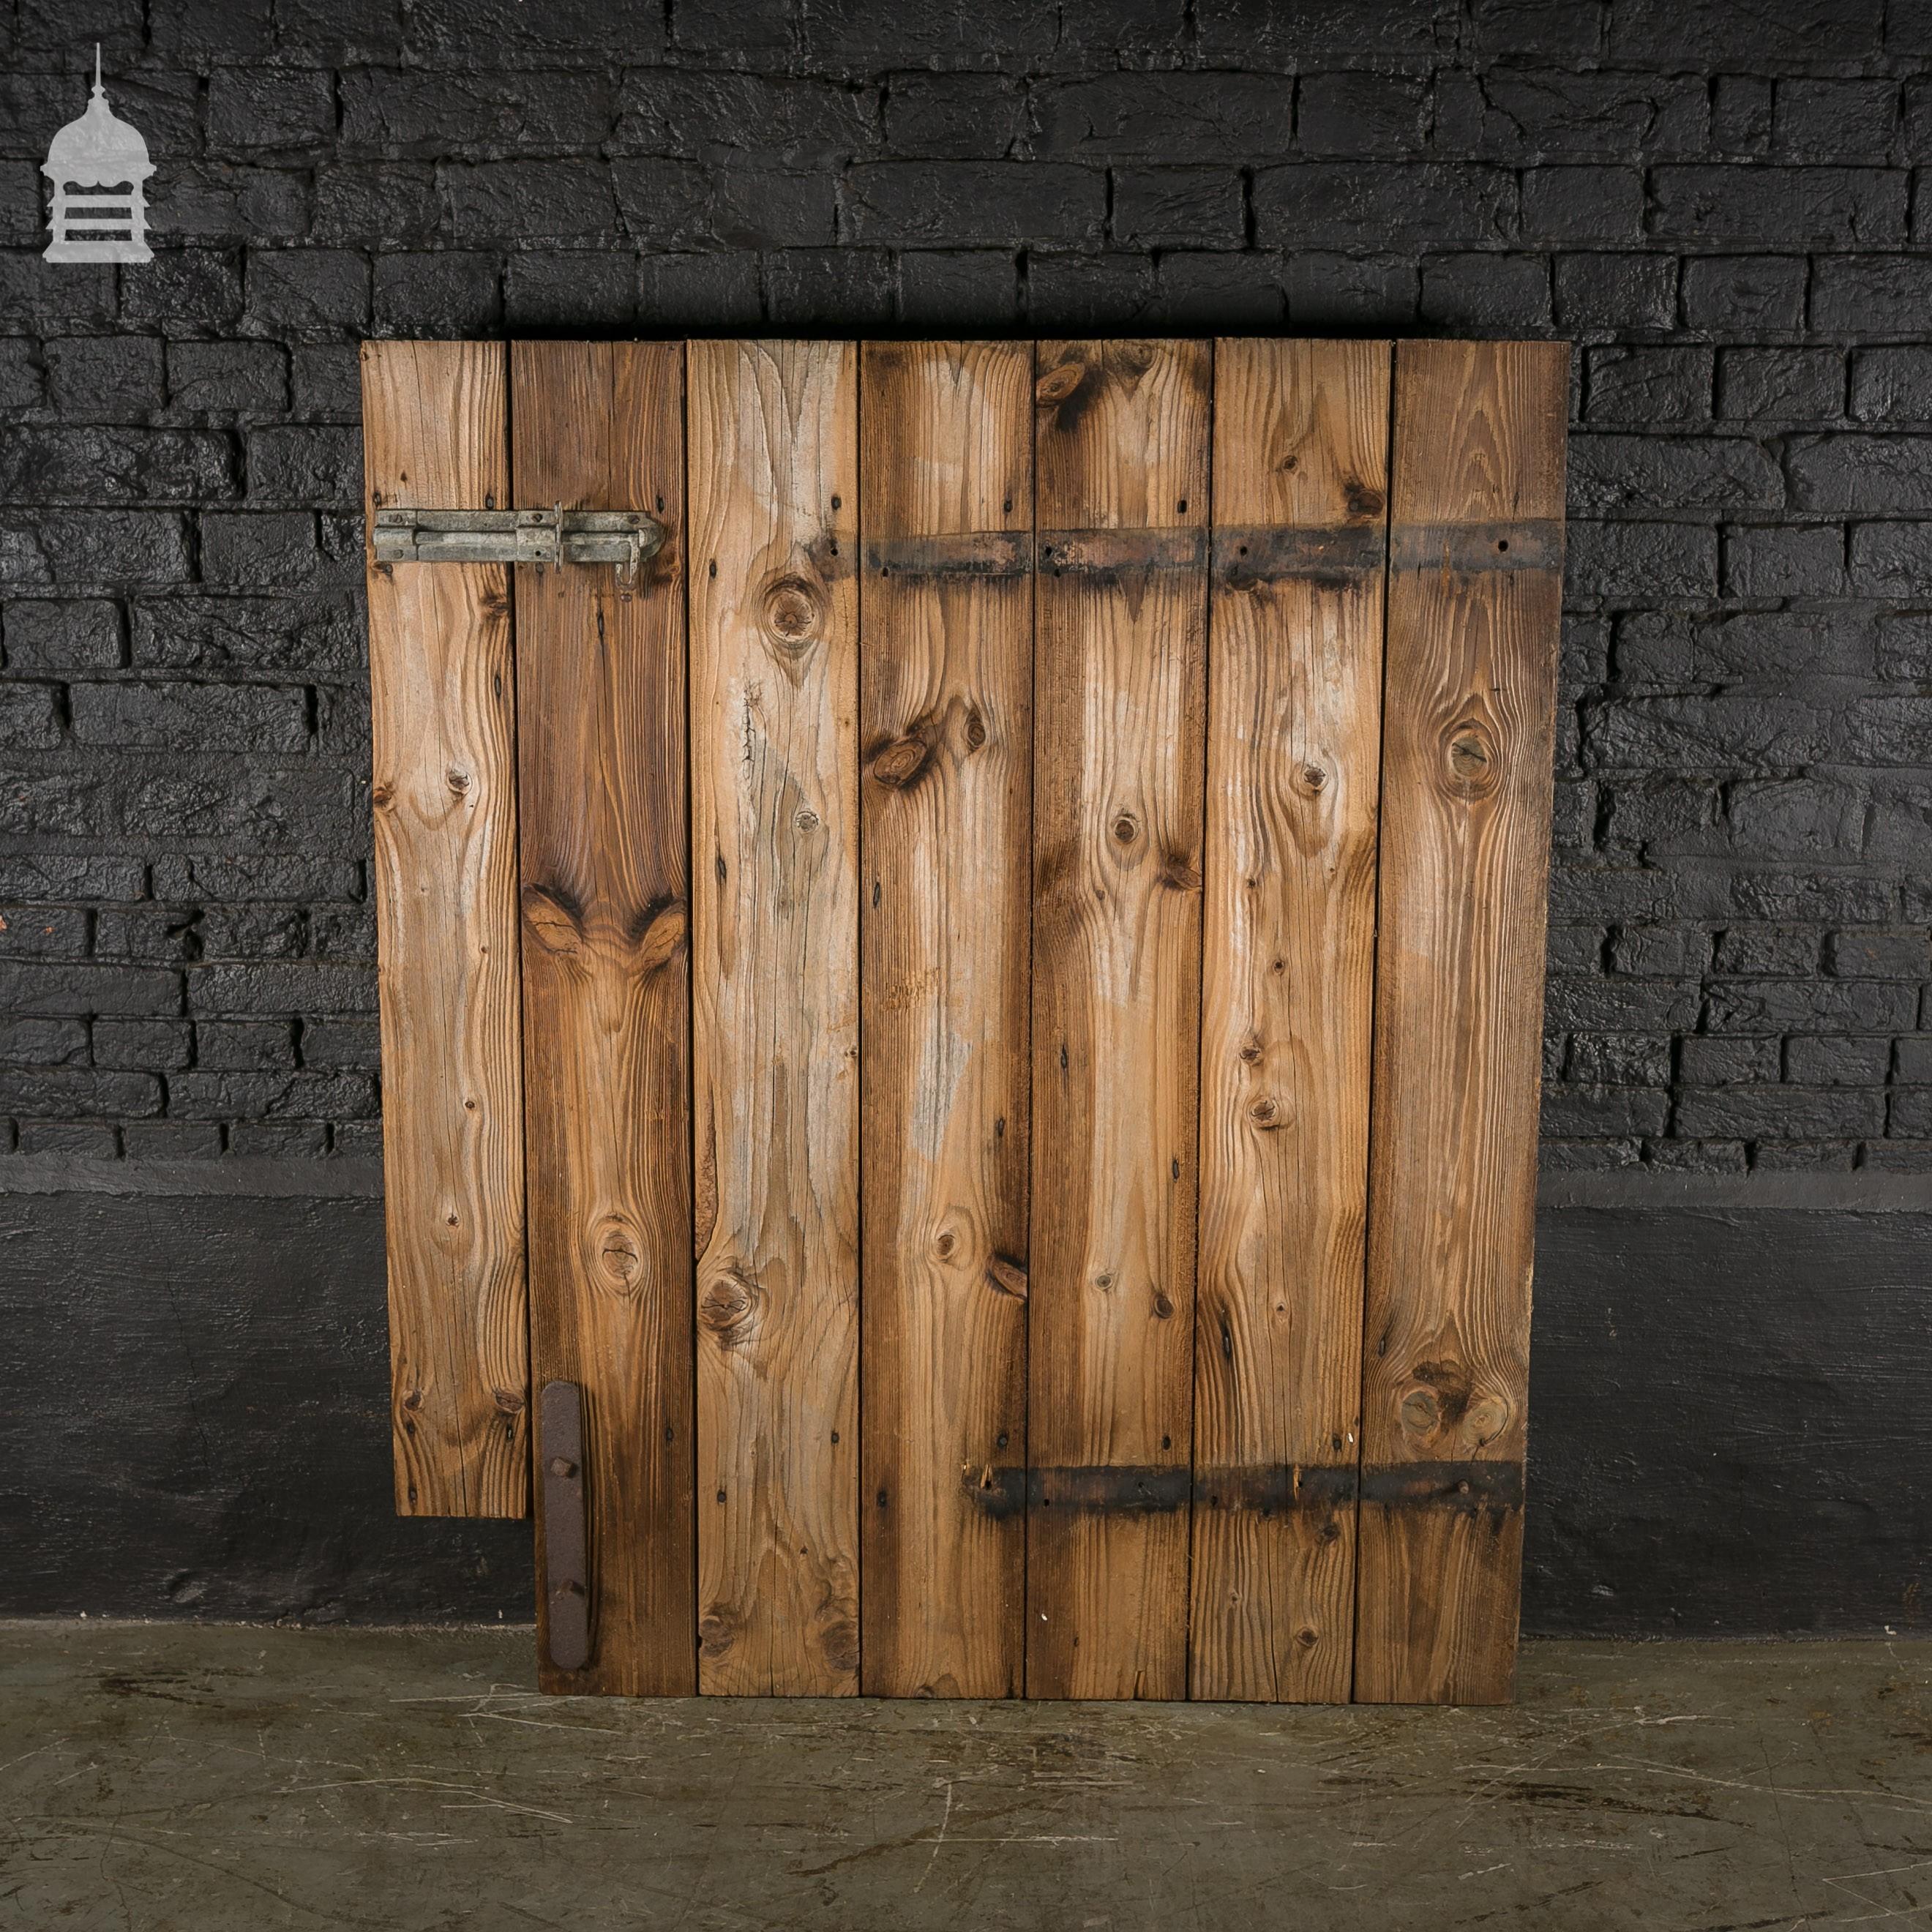 Rustic Pine Ledged And Braced Barn Door. Basement Definition. Basement Tool Storage. Basement Soil. Houses For Rent With Finished Basement. Kitchen In The Basement. Walkout Basement Designs. Dream Basements. Gone Home Basement Safe